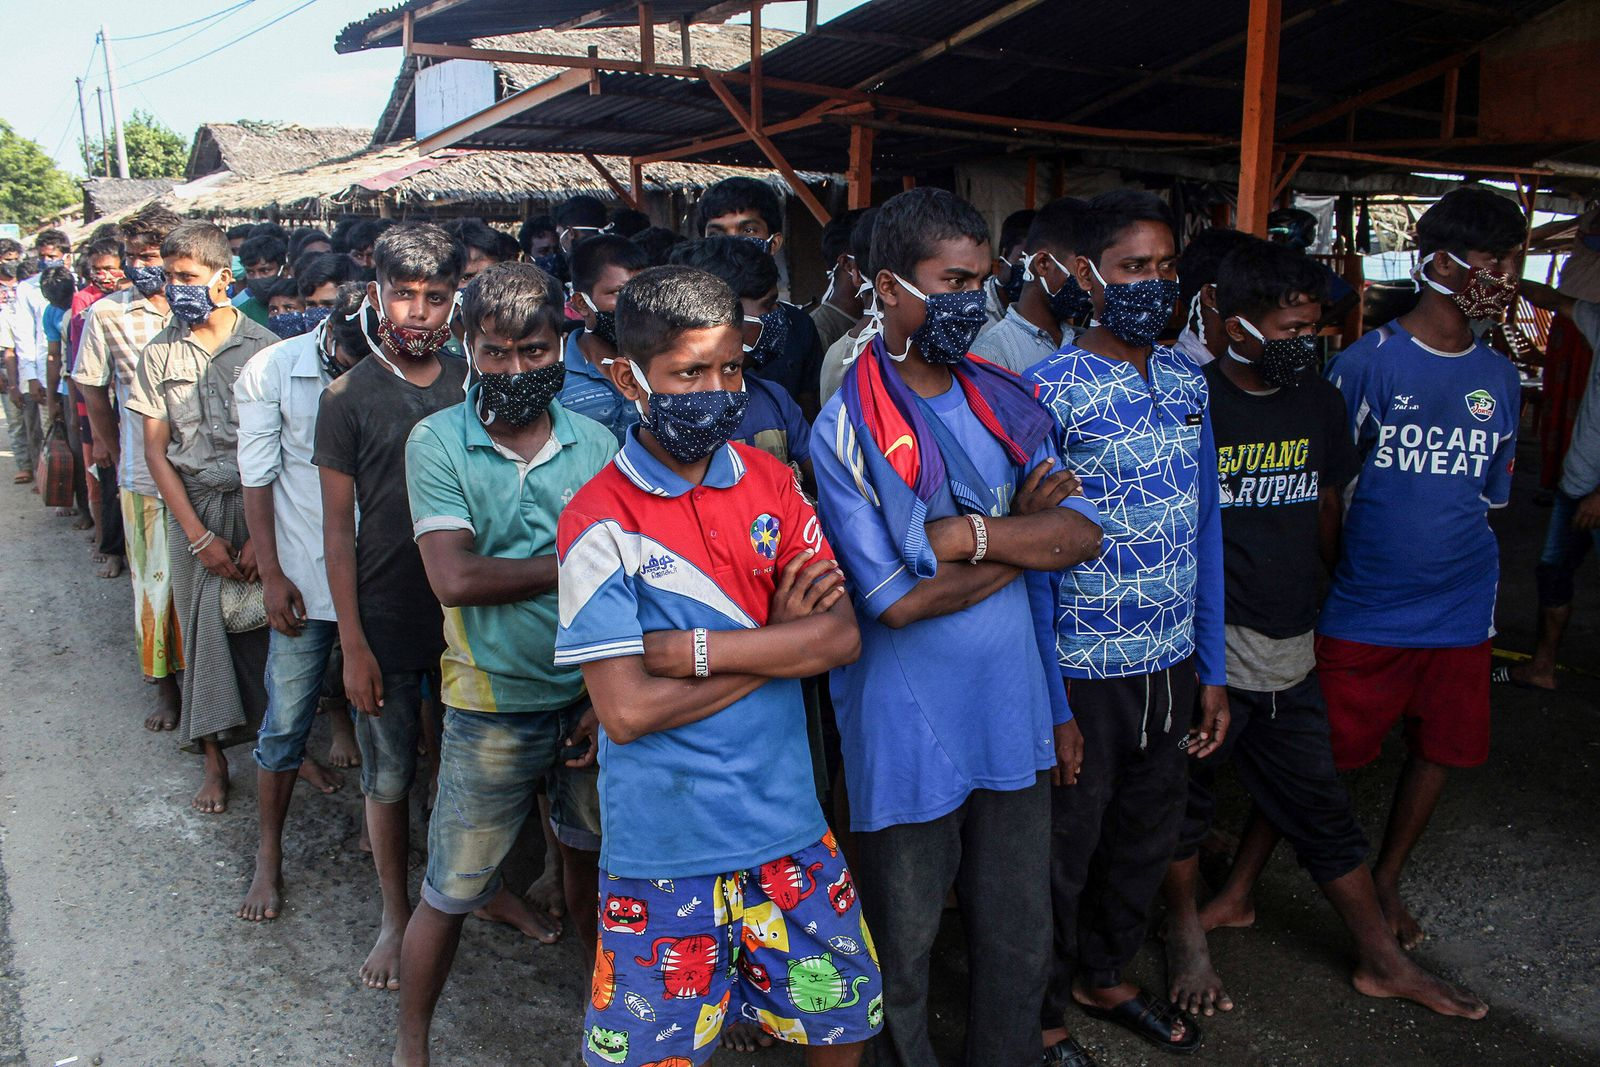 September 7, 2020, Lhokseumawe, Indonesia: Rohingya ethnic refugees wearing facemasks are seen being evacuated to a tem